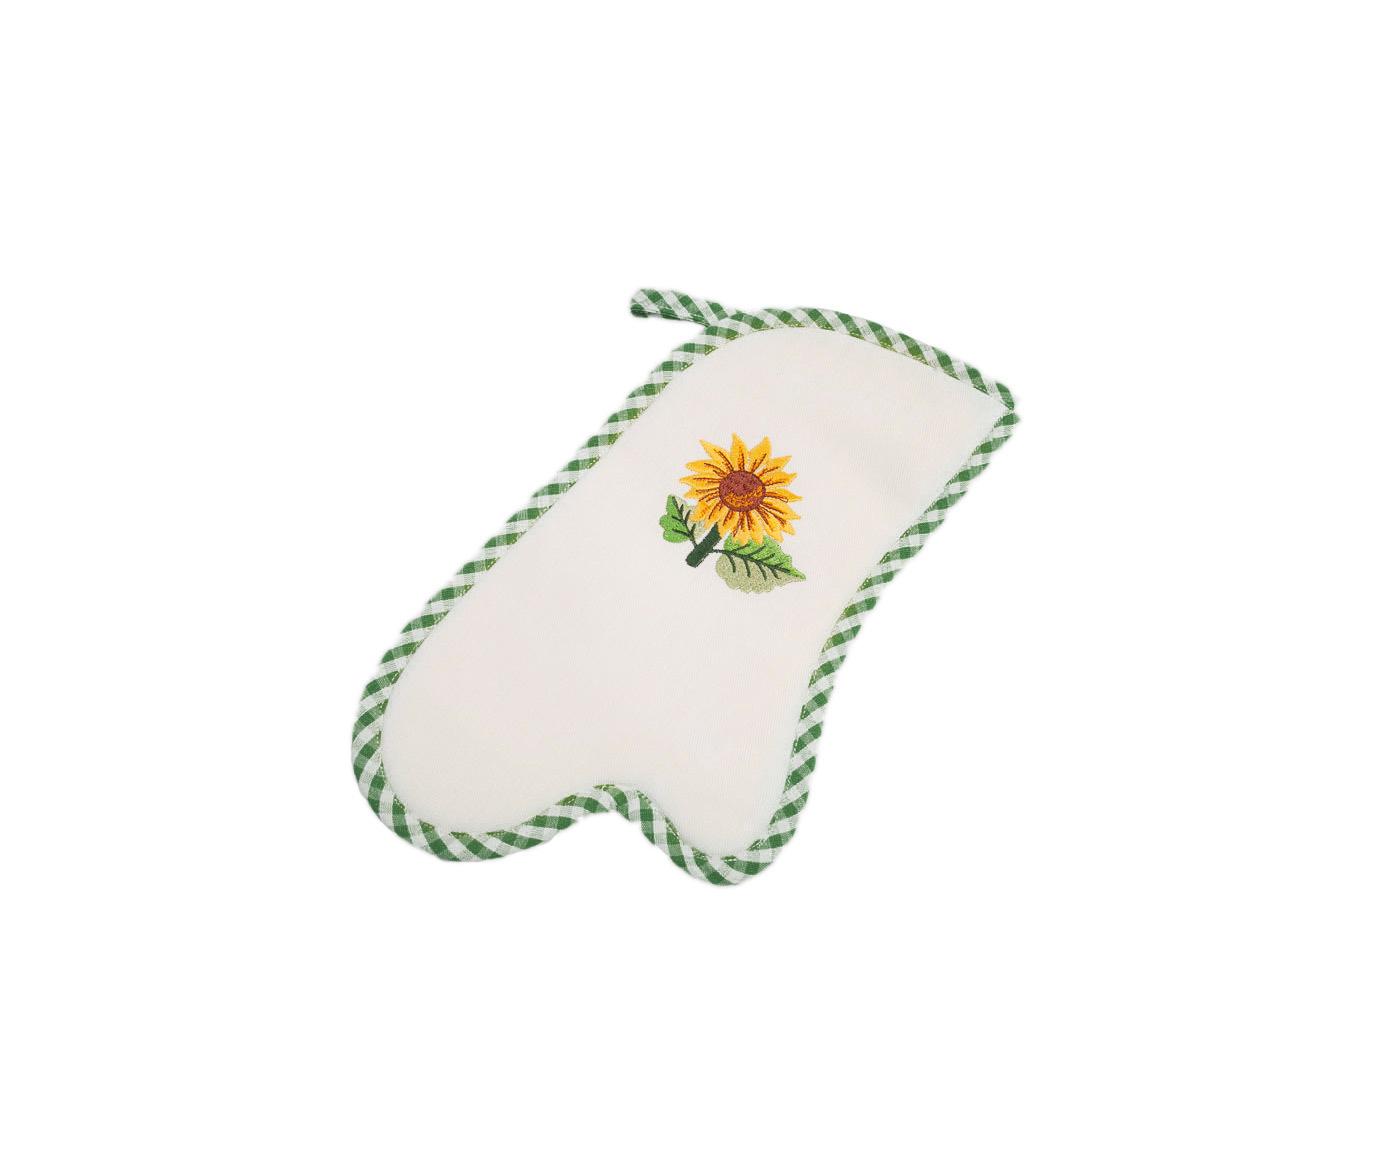 Прихватки Прихватка-варежка Old Florence Girasoli с зелёным кантом prihvatka-varezhka-girasoli-s-zelenim-kantom-ot-old-florence-italiya.jpg